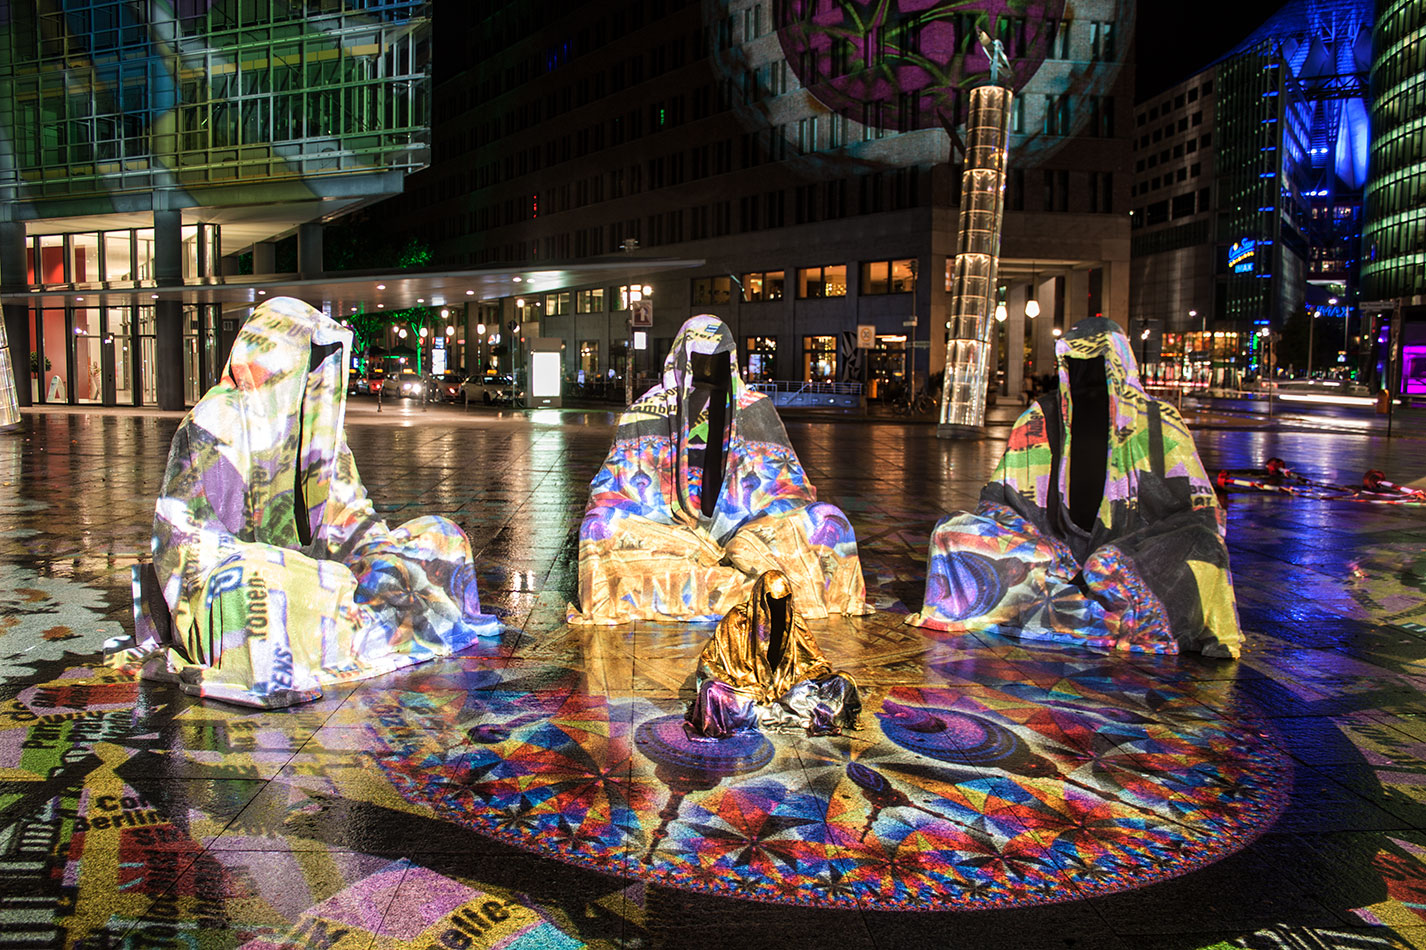 festival-of-lights-berlin-light-art-festival-contemporary-fine-art-design-show-large-scale-sculpture-guardiansof-time-manfred-kili-kielnhofer-sculpture-3869